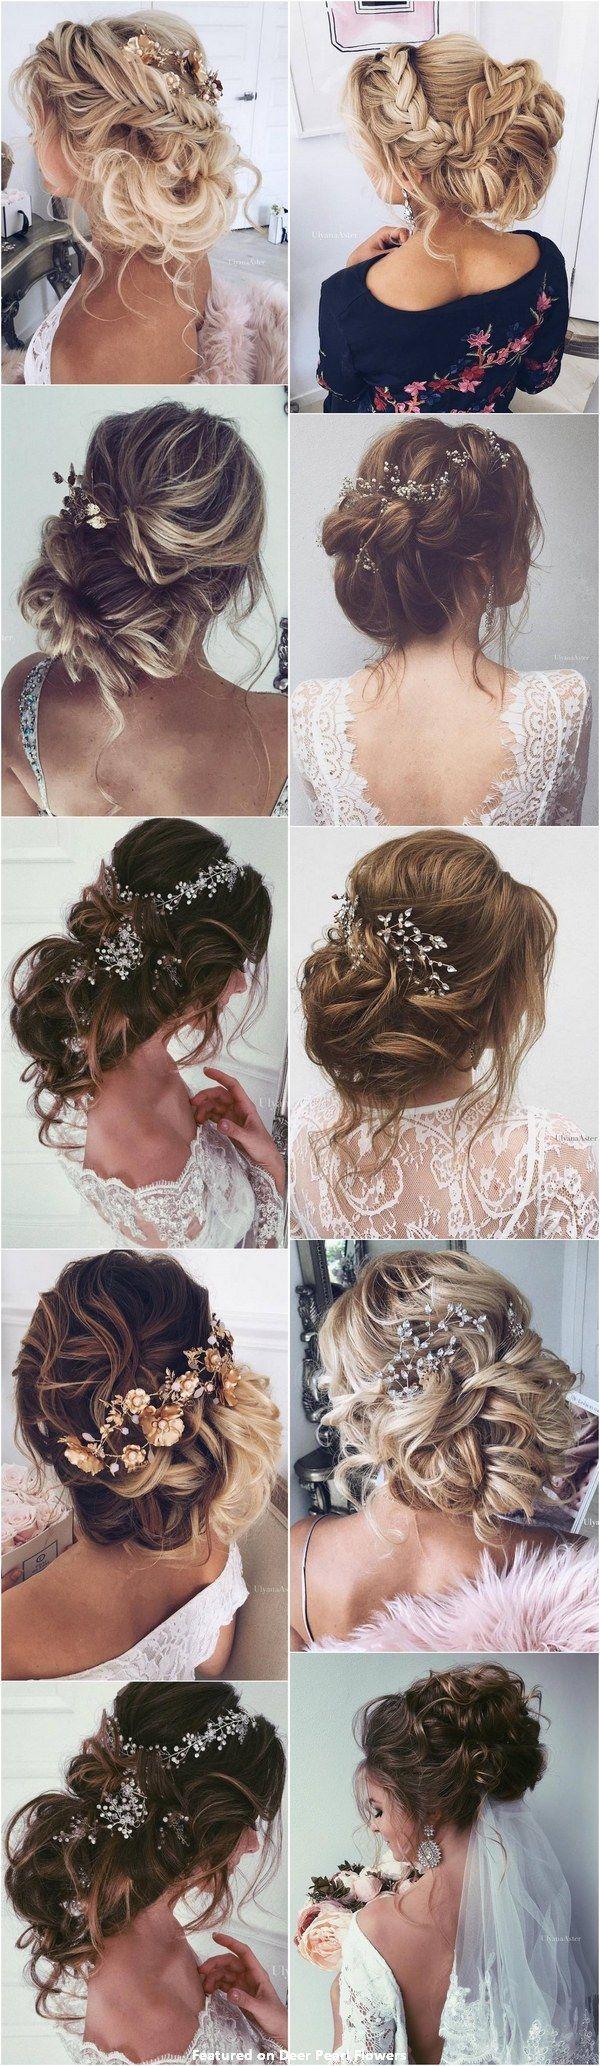 65 New Romantic Long Bridal Wedding Hairstyles to Try / Ulyana Aster www.ulyanaa...